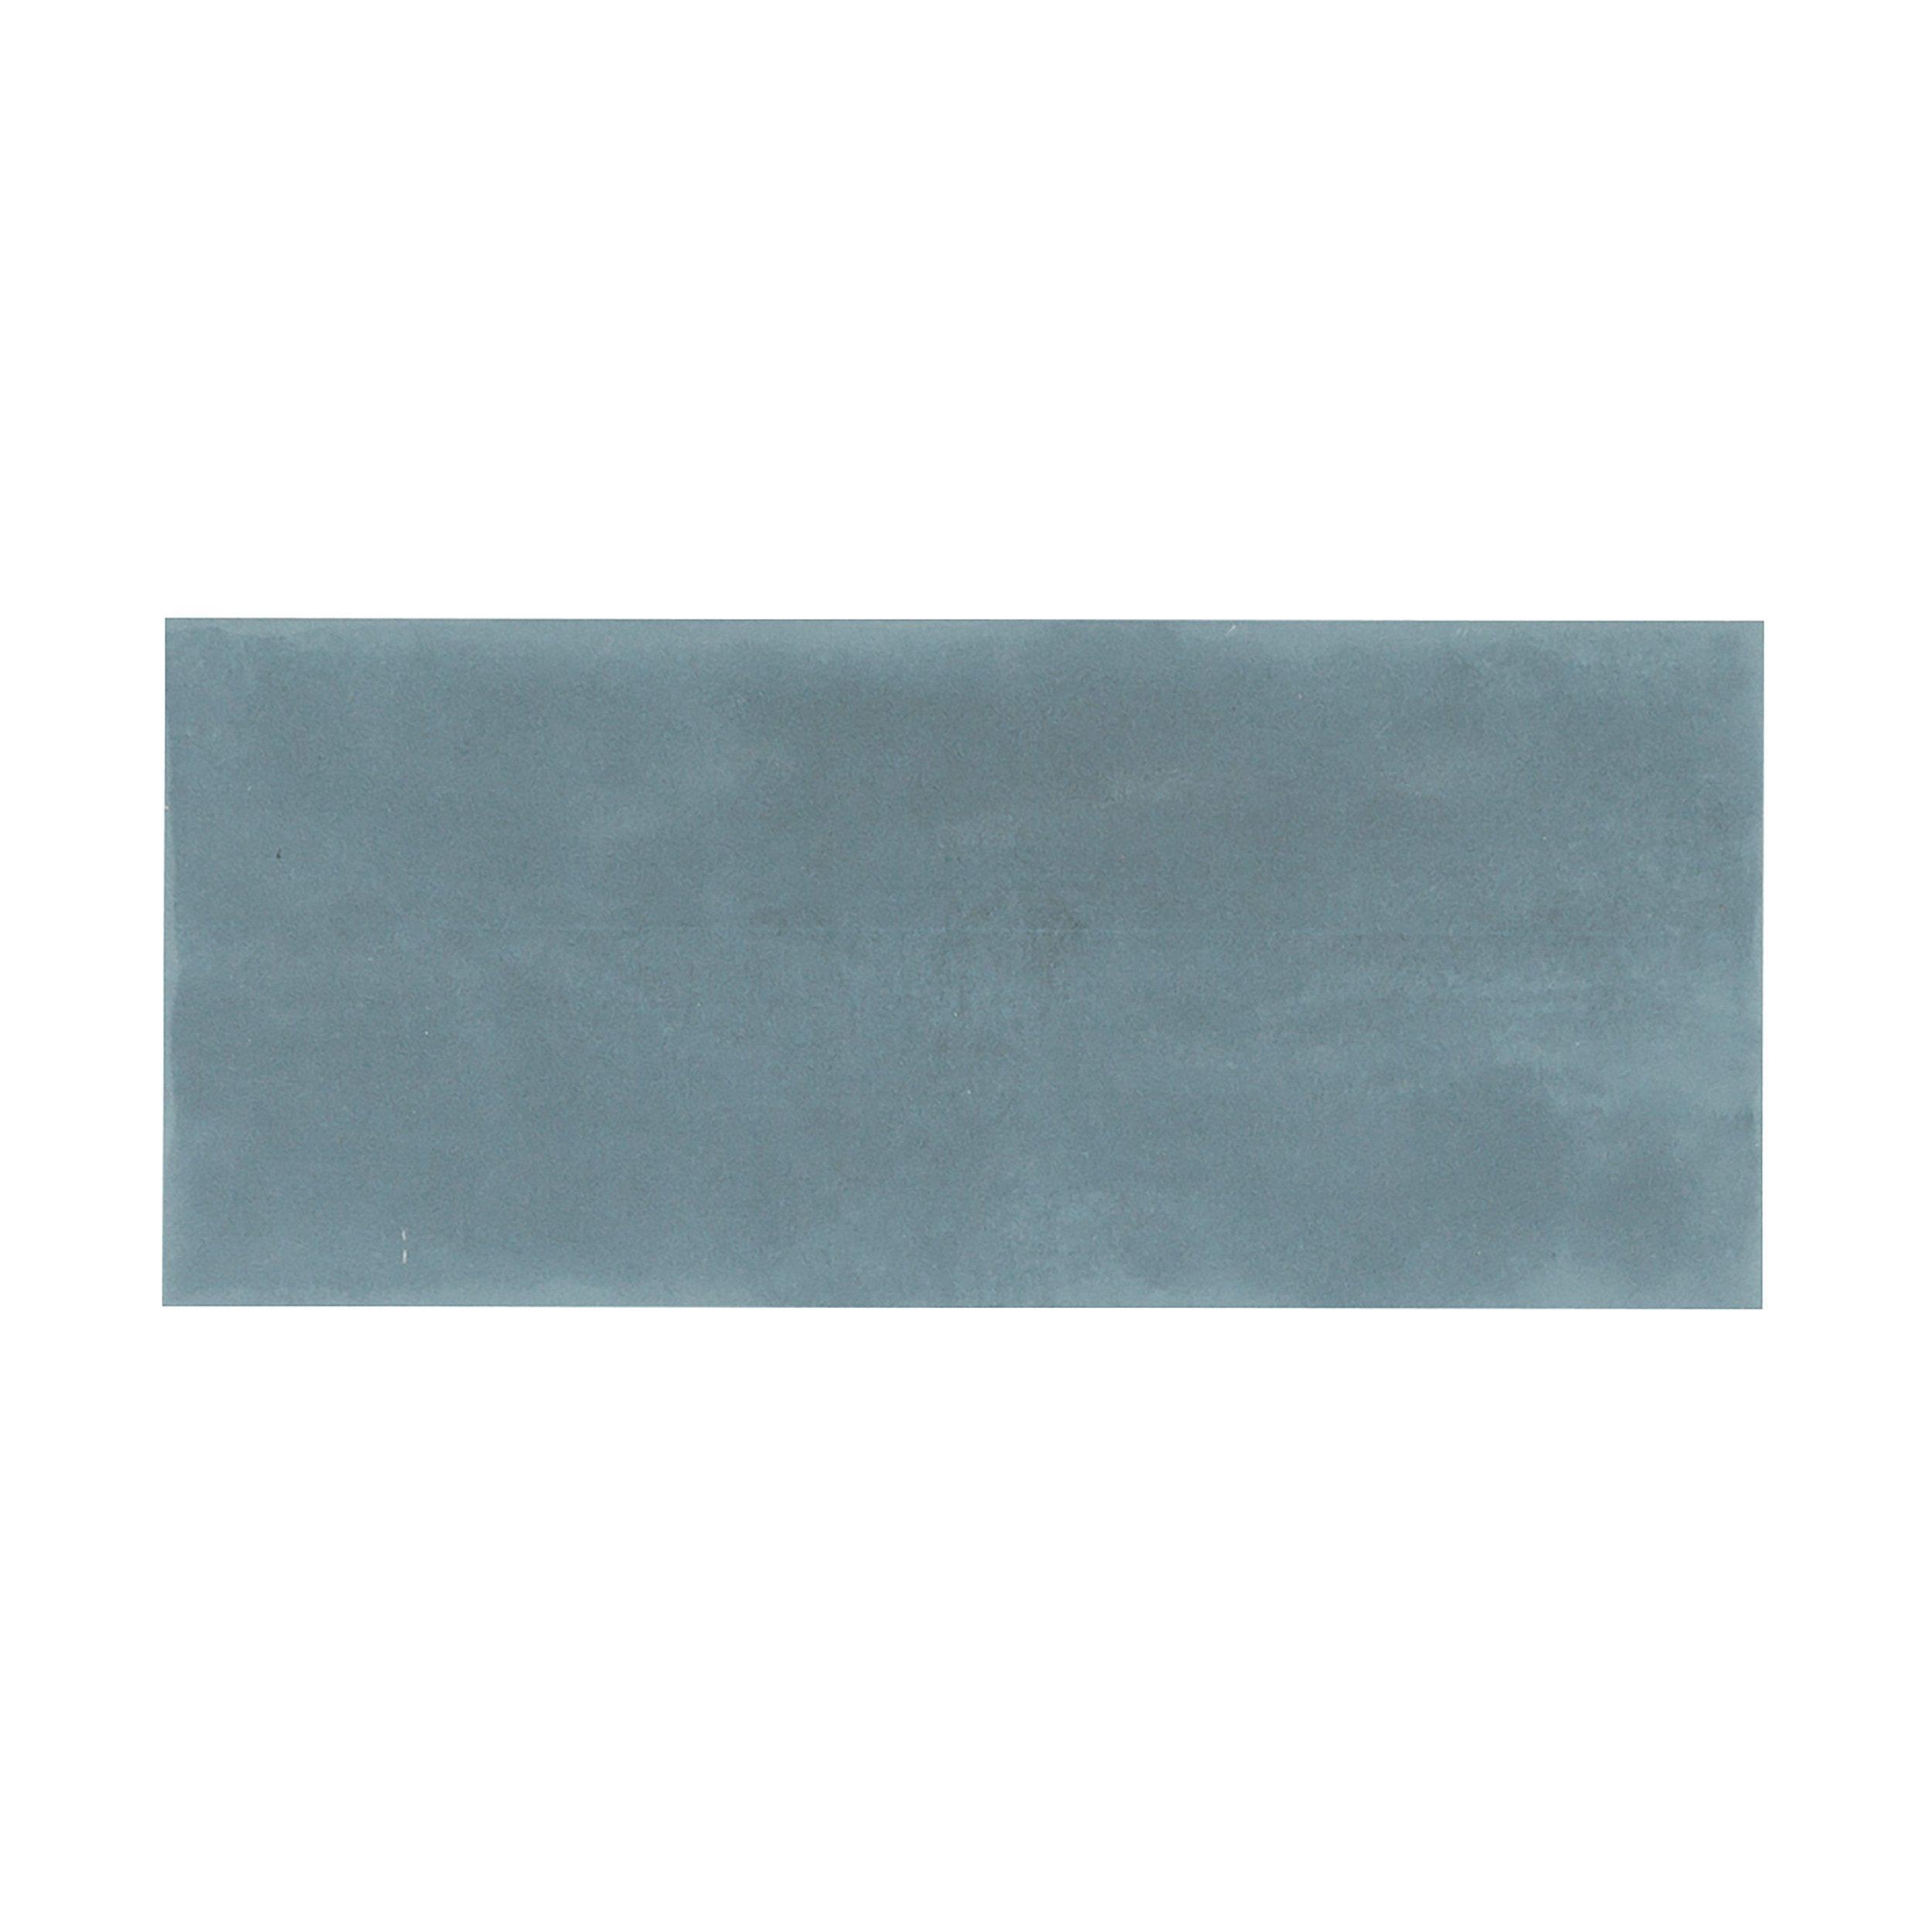 seaside polished ceramic tile 4 x 16